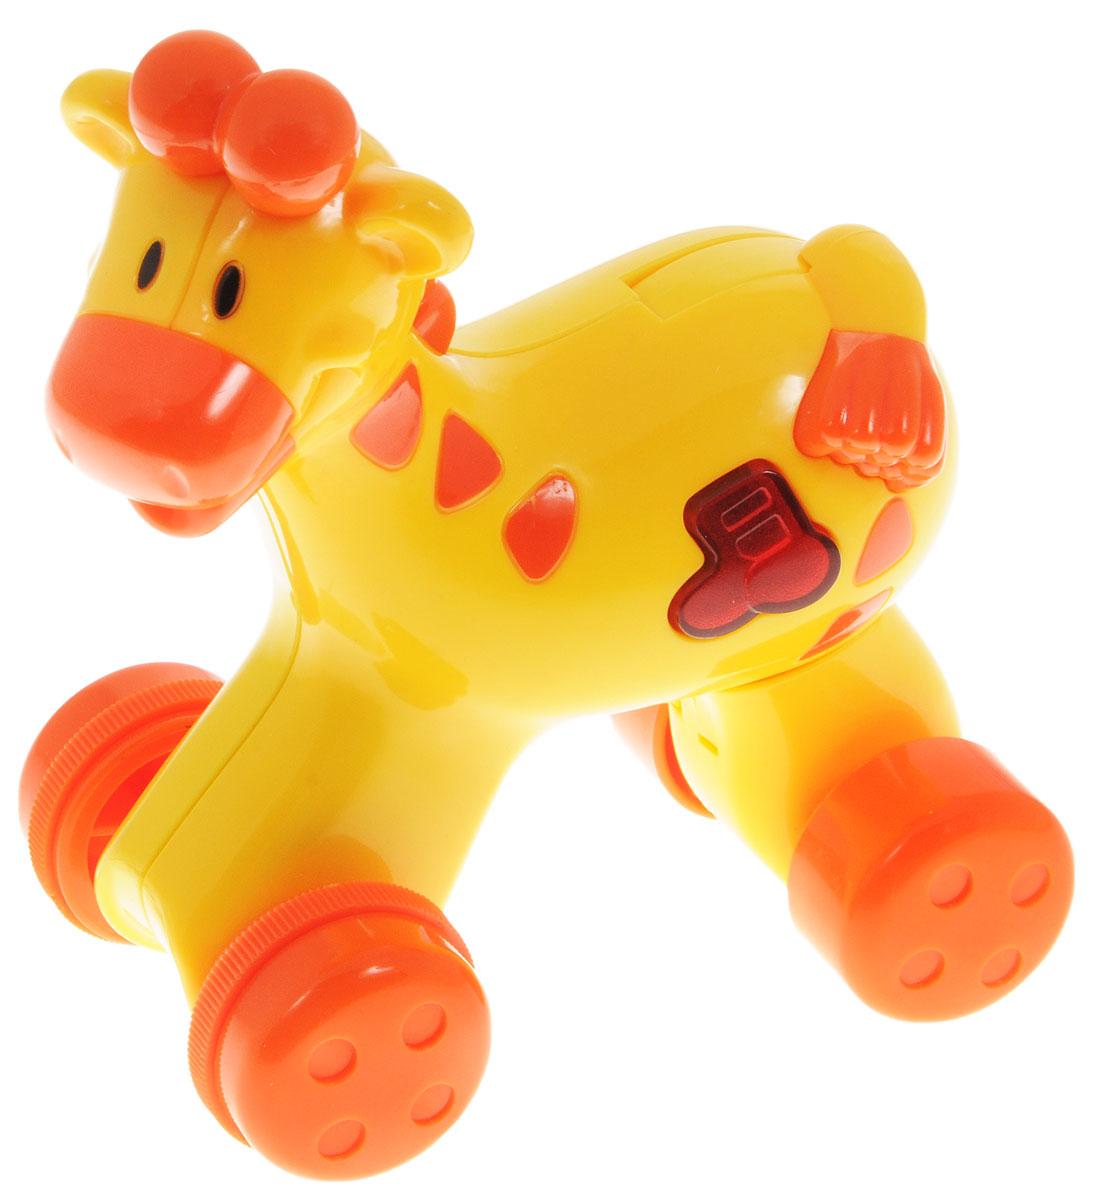 Navystar Музыкальная игрушка-каталка Жираф т а курышева музыкальная журналистика и музыкальная критика